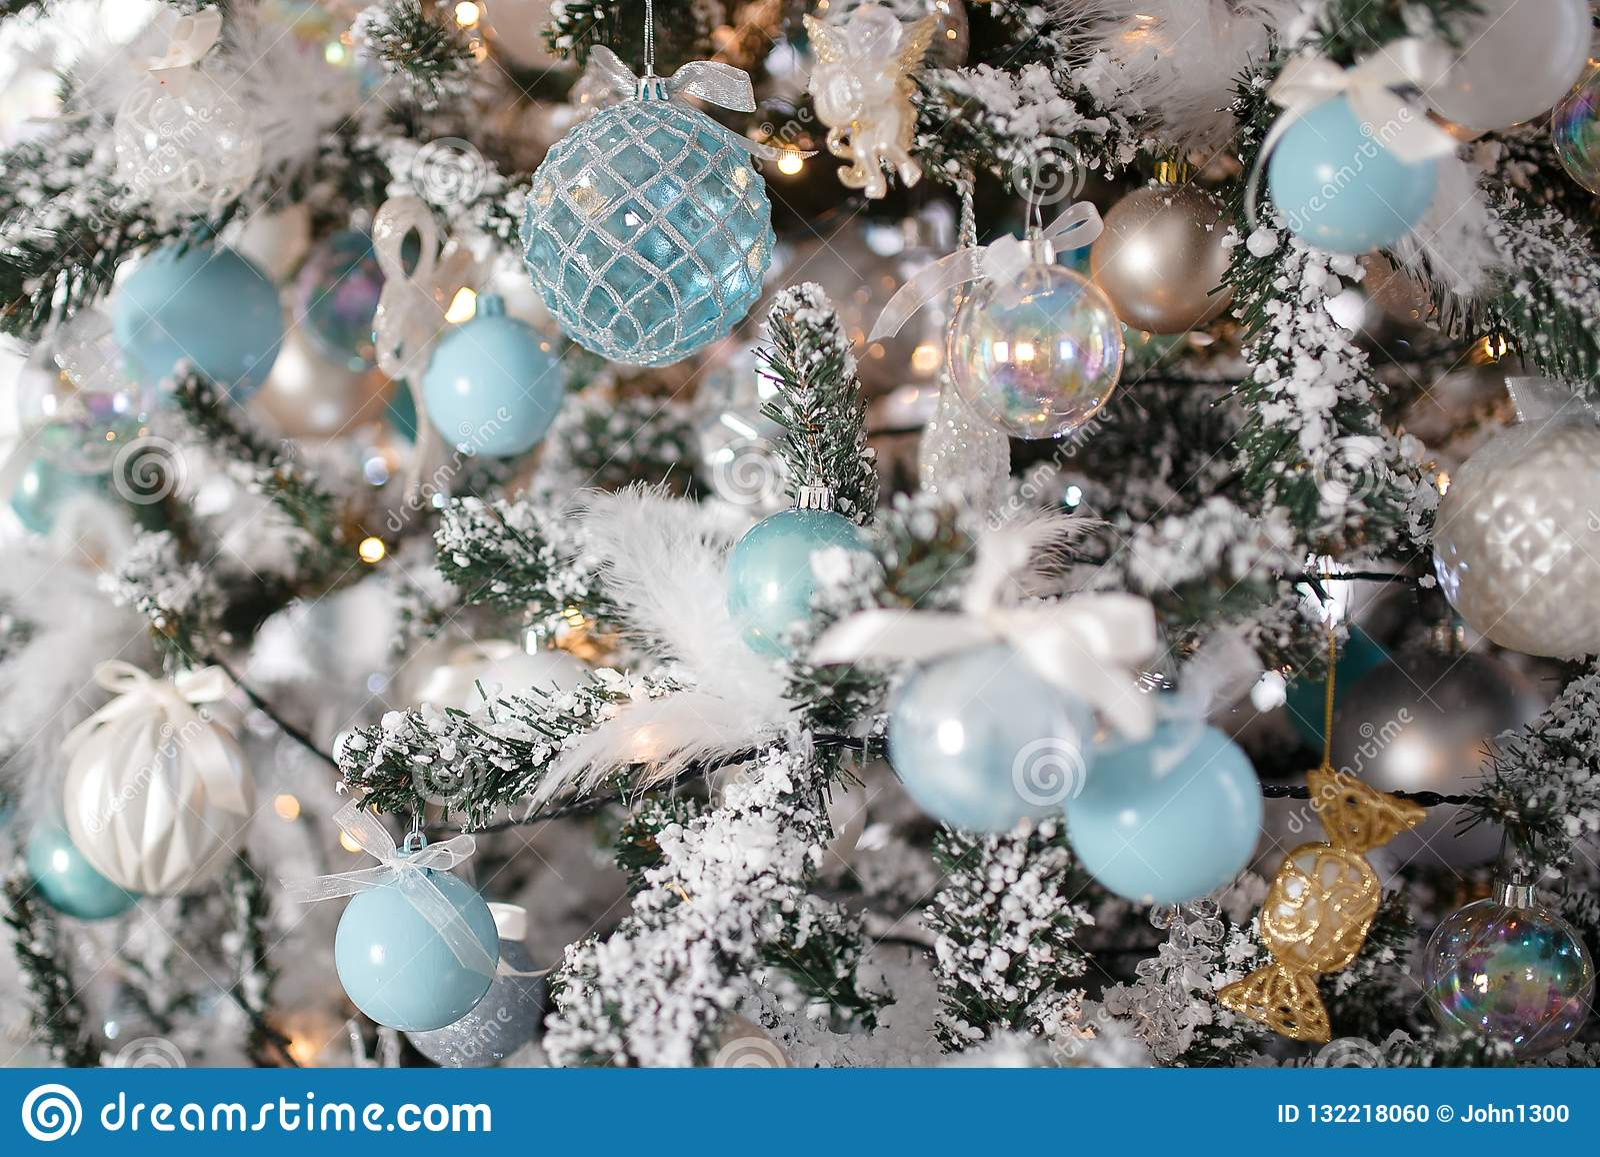 Closeup Christmas Tree Toy Light Background Stock Photo Image Of Blue Holiday 132218060